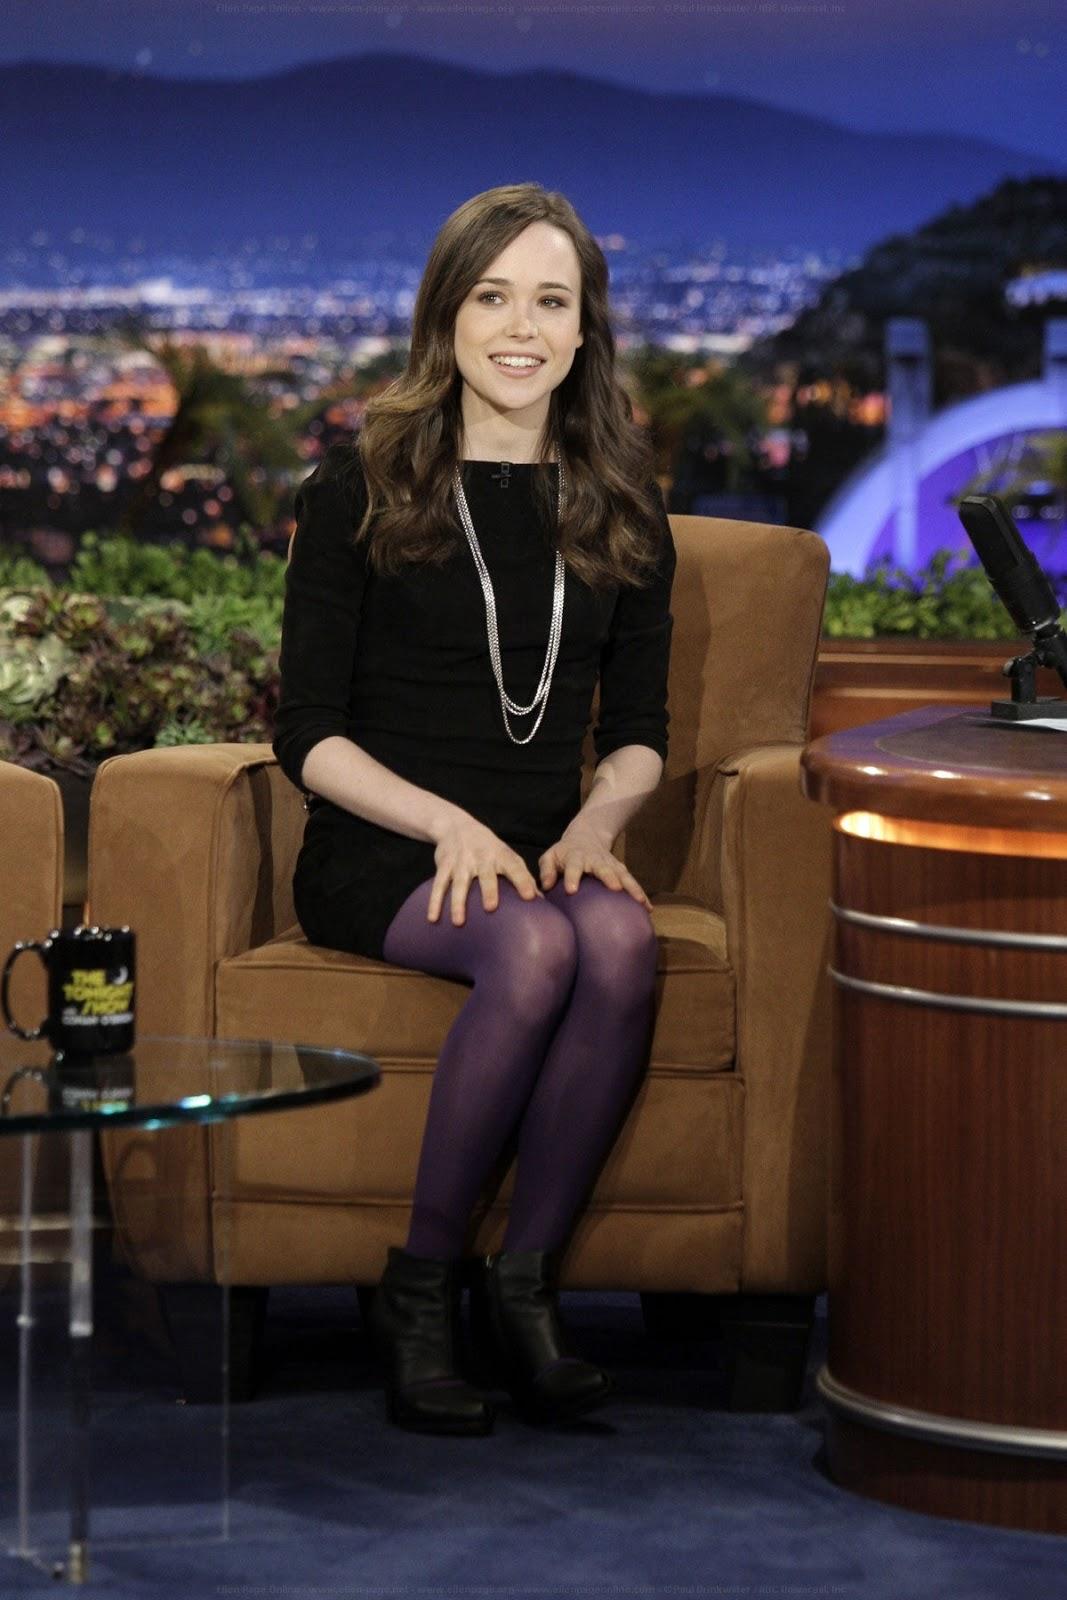 Photo Page: Ellen Page Photo 197 Of 253 Pics, Wallpaper